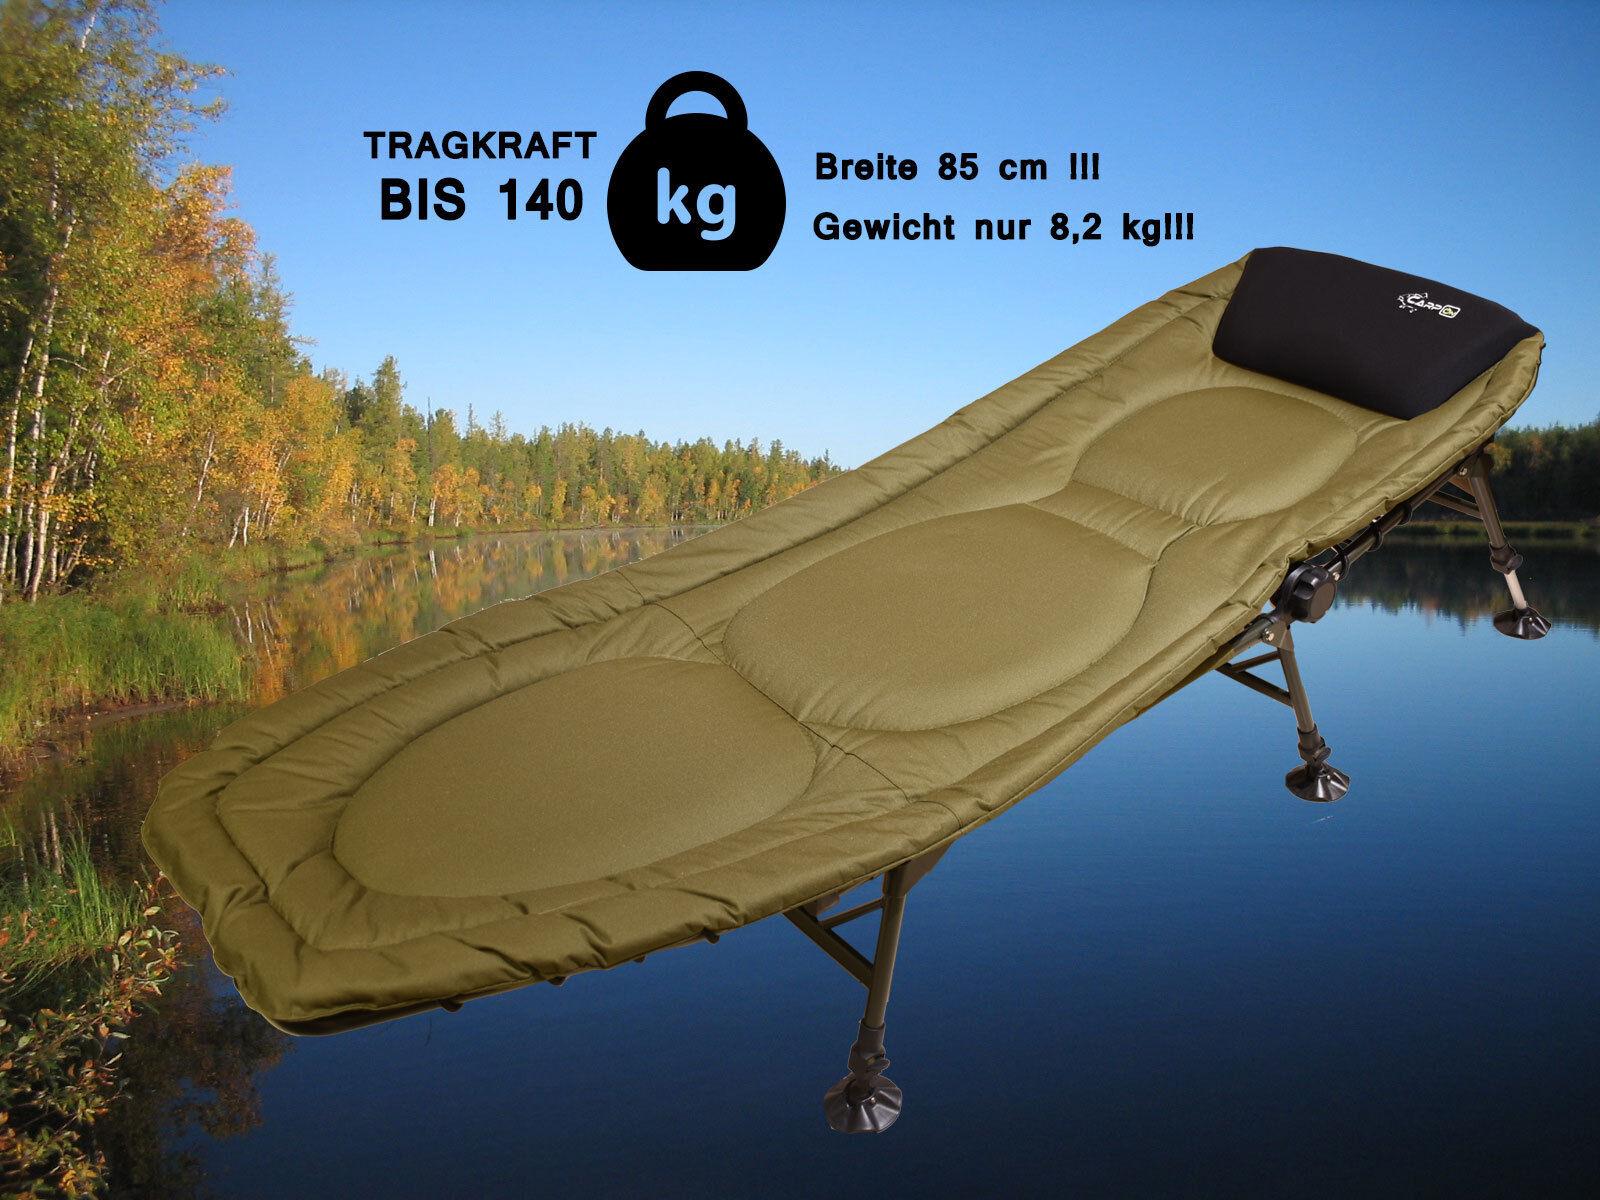 Ciprinidos tumbona de aluminio camping tumbona carpon Flix tumbona bedchair